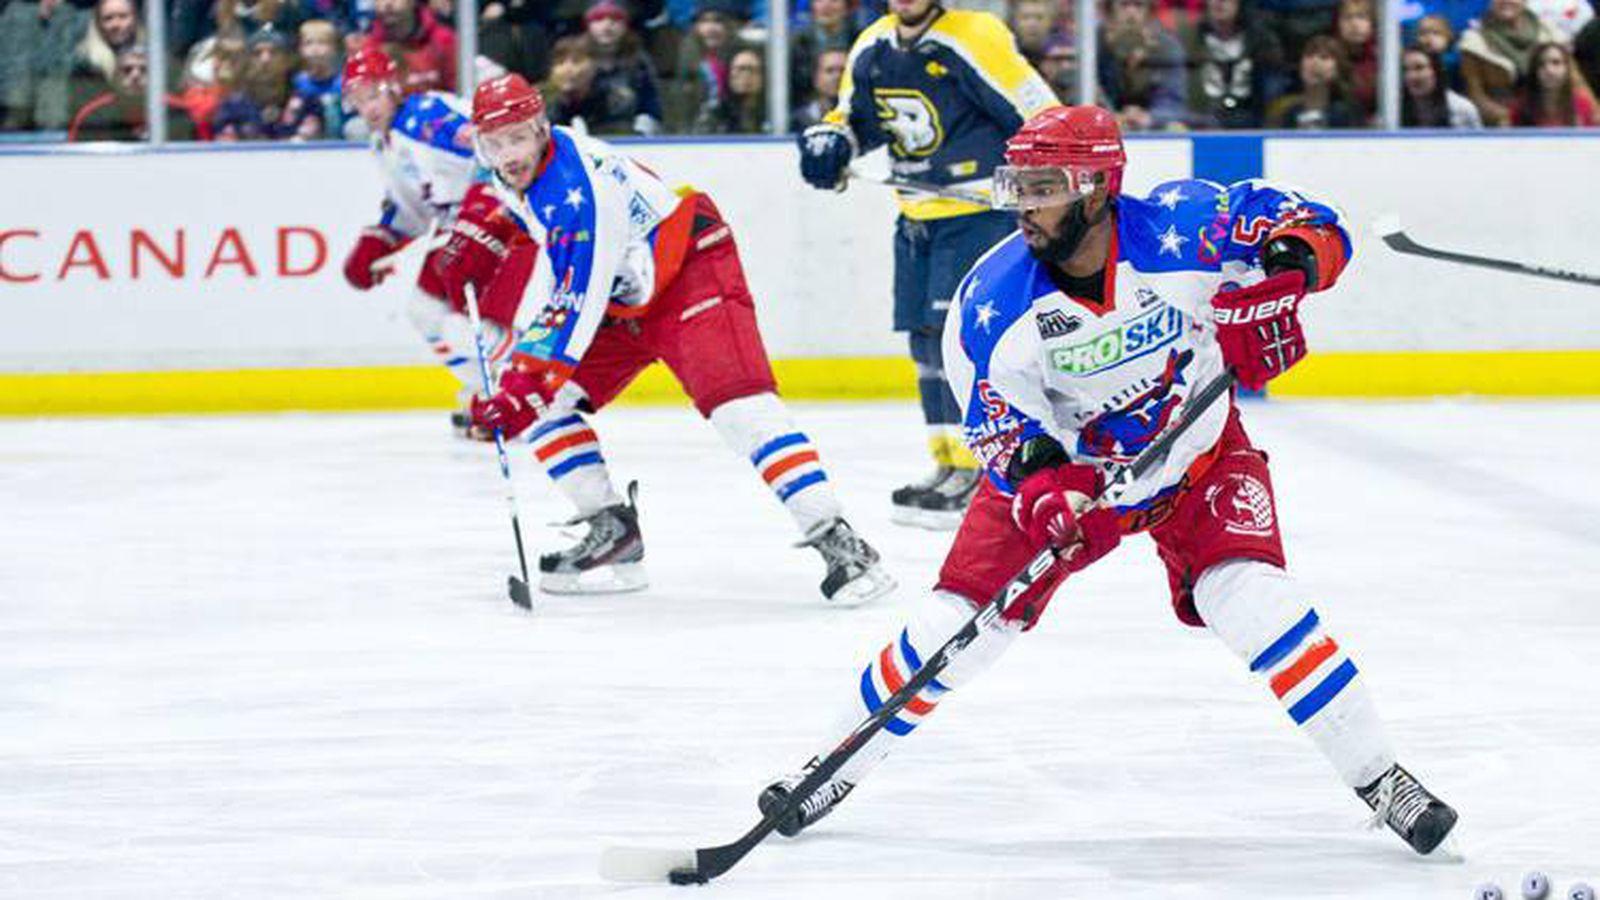 Ice-hockey-newcastle-north-stars-21.0.0